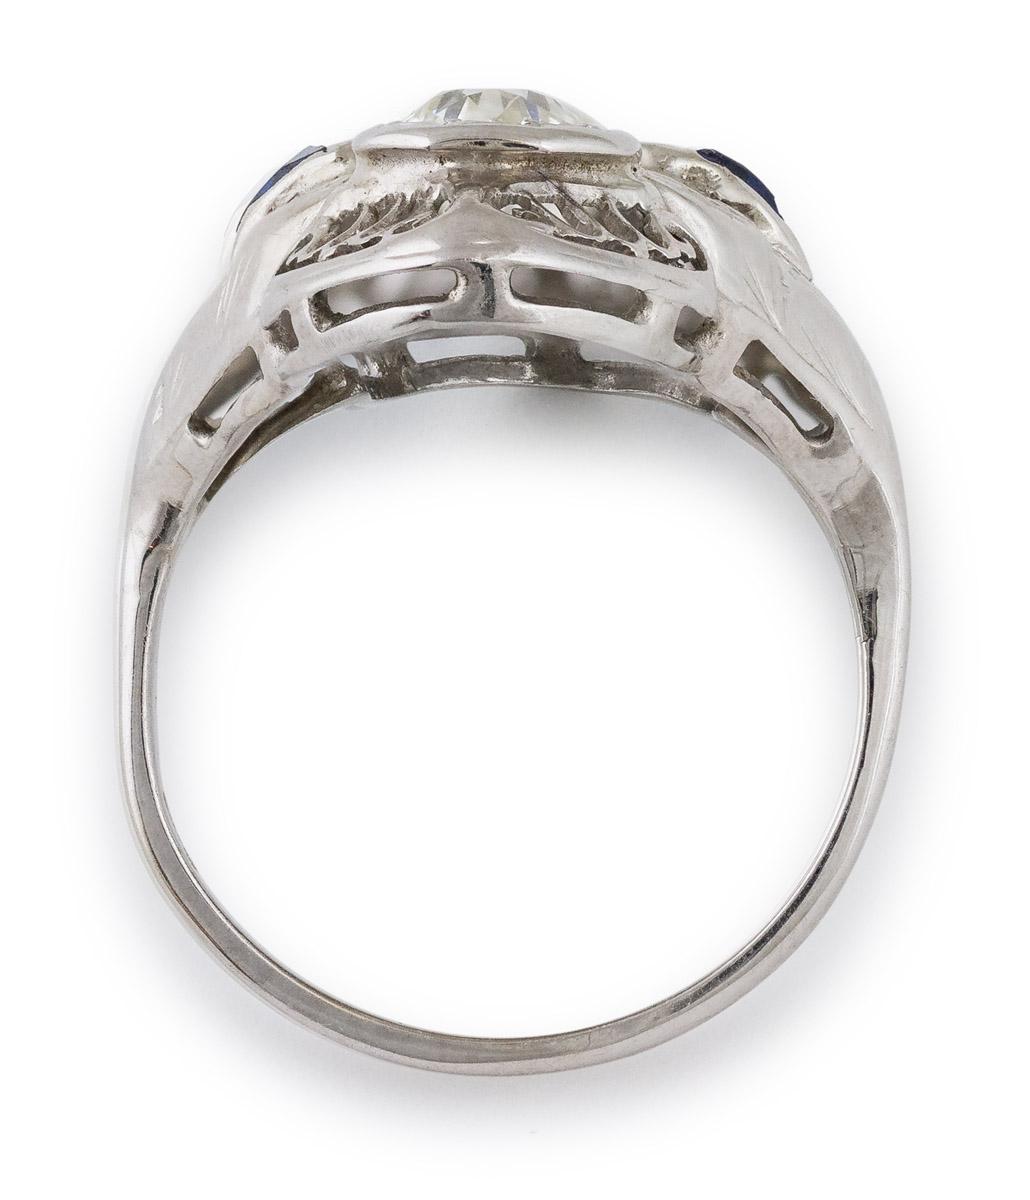 Vintage Filigree Diamond and Sapphire Ring - Top